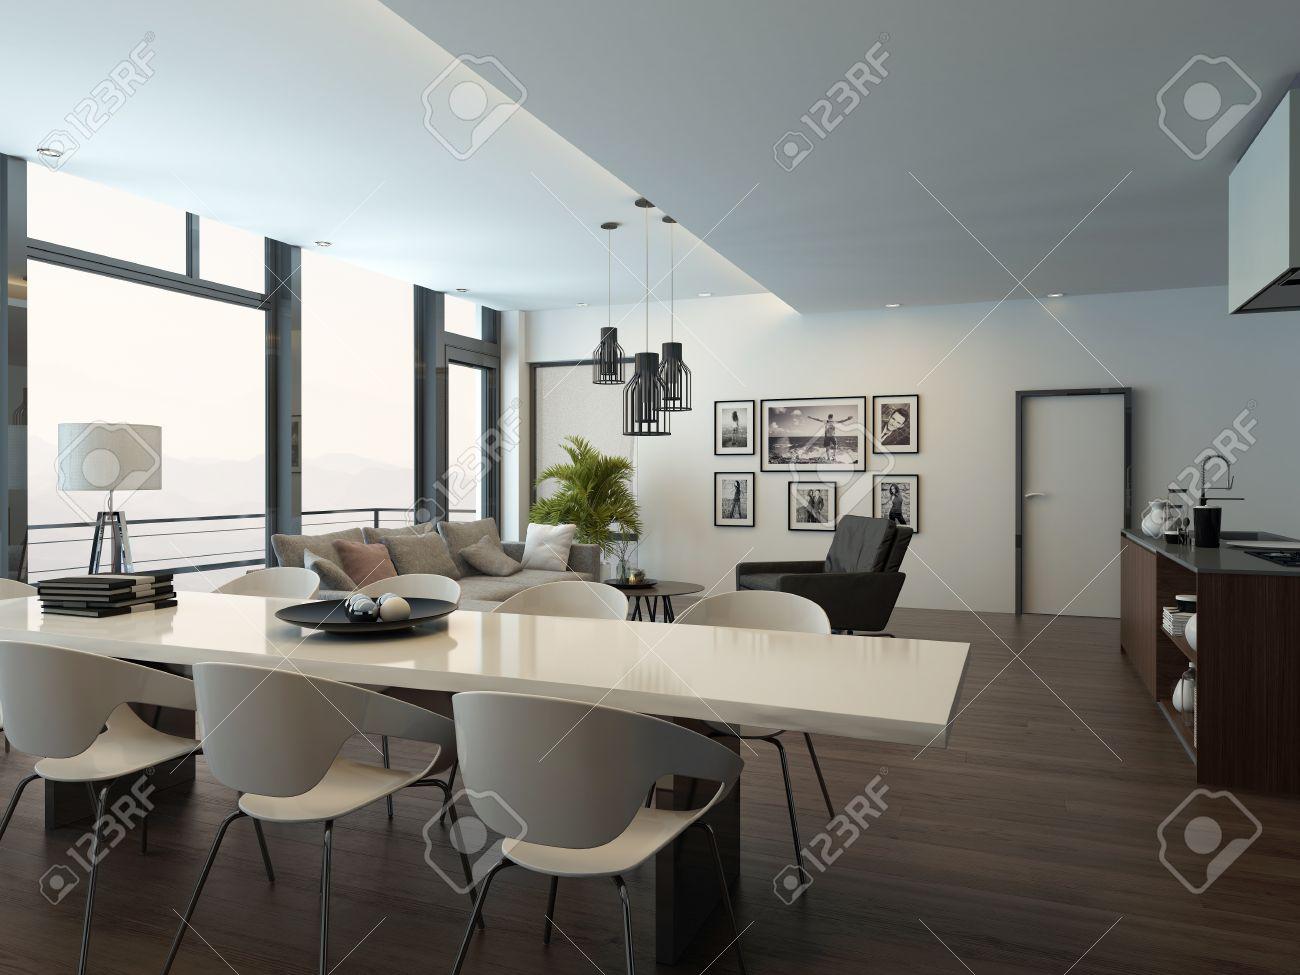 Full Size of Luxury Modern Apartment Living Room Interior Küche Sitzecke Küche